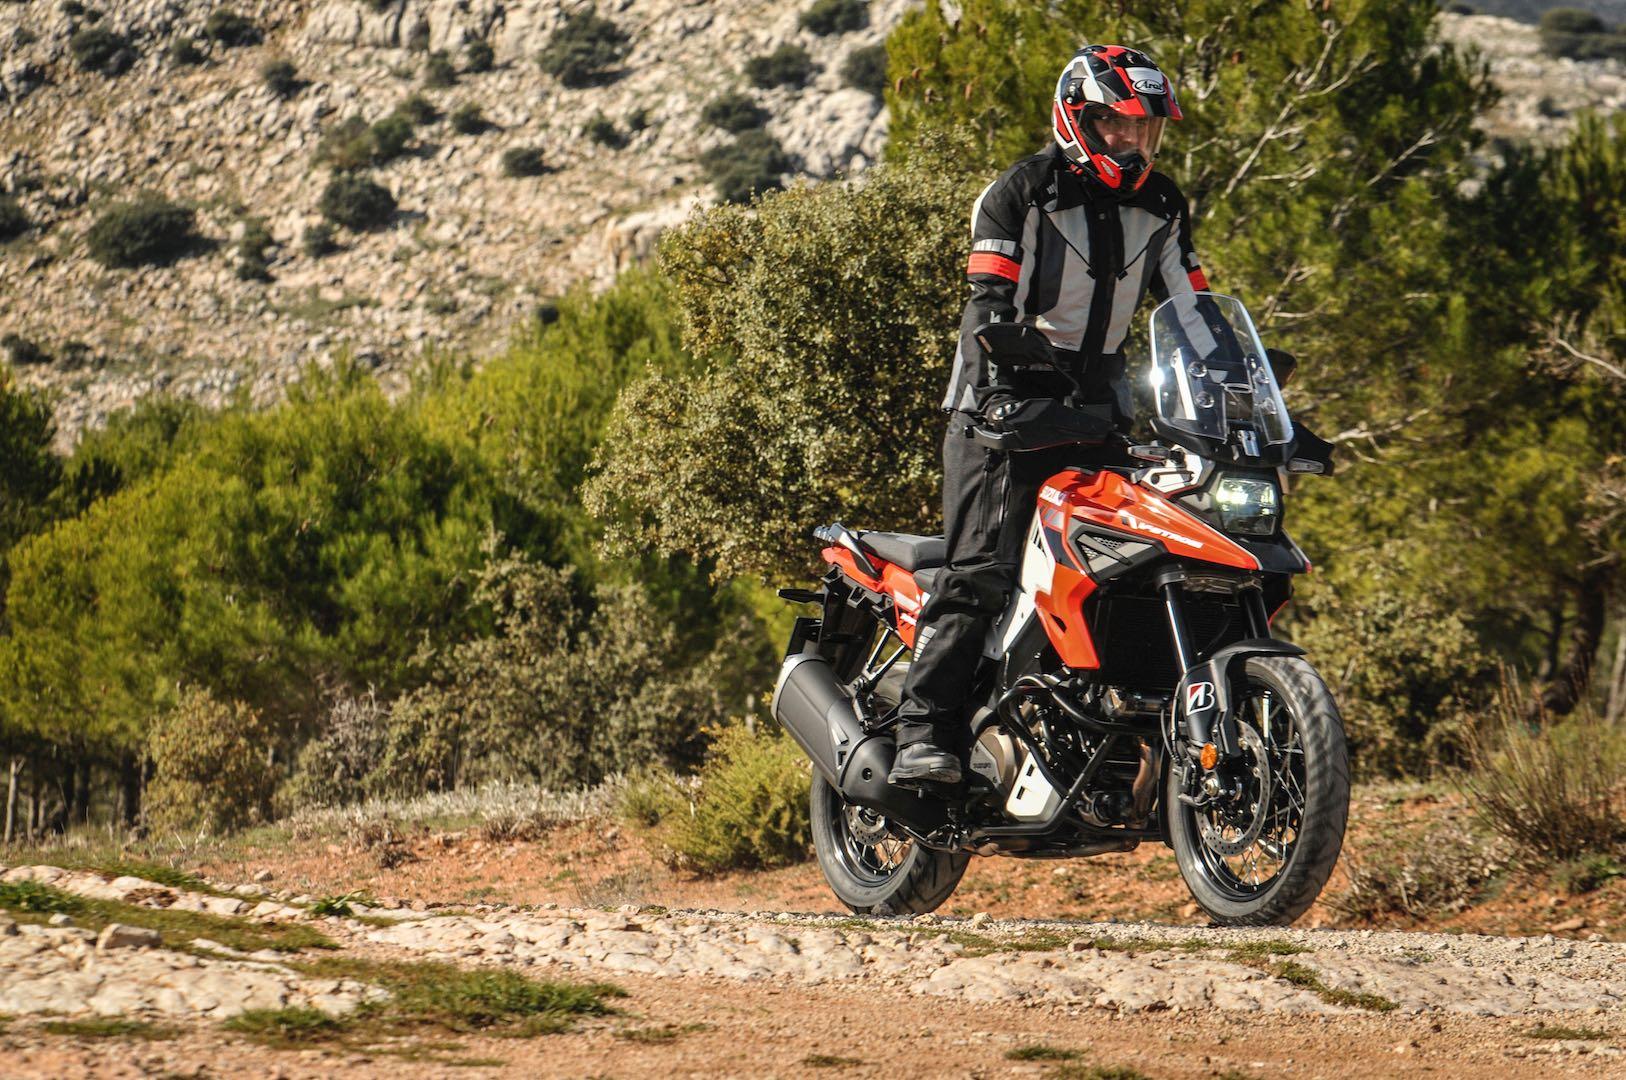 2020 Suzuki V-Strom 1050XT Test: Simply Taking On Spain